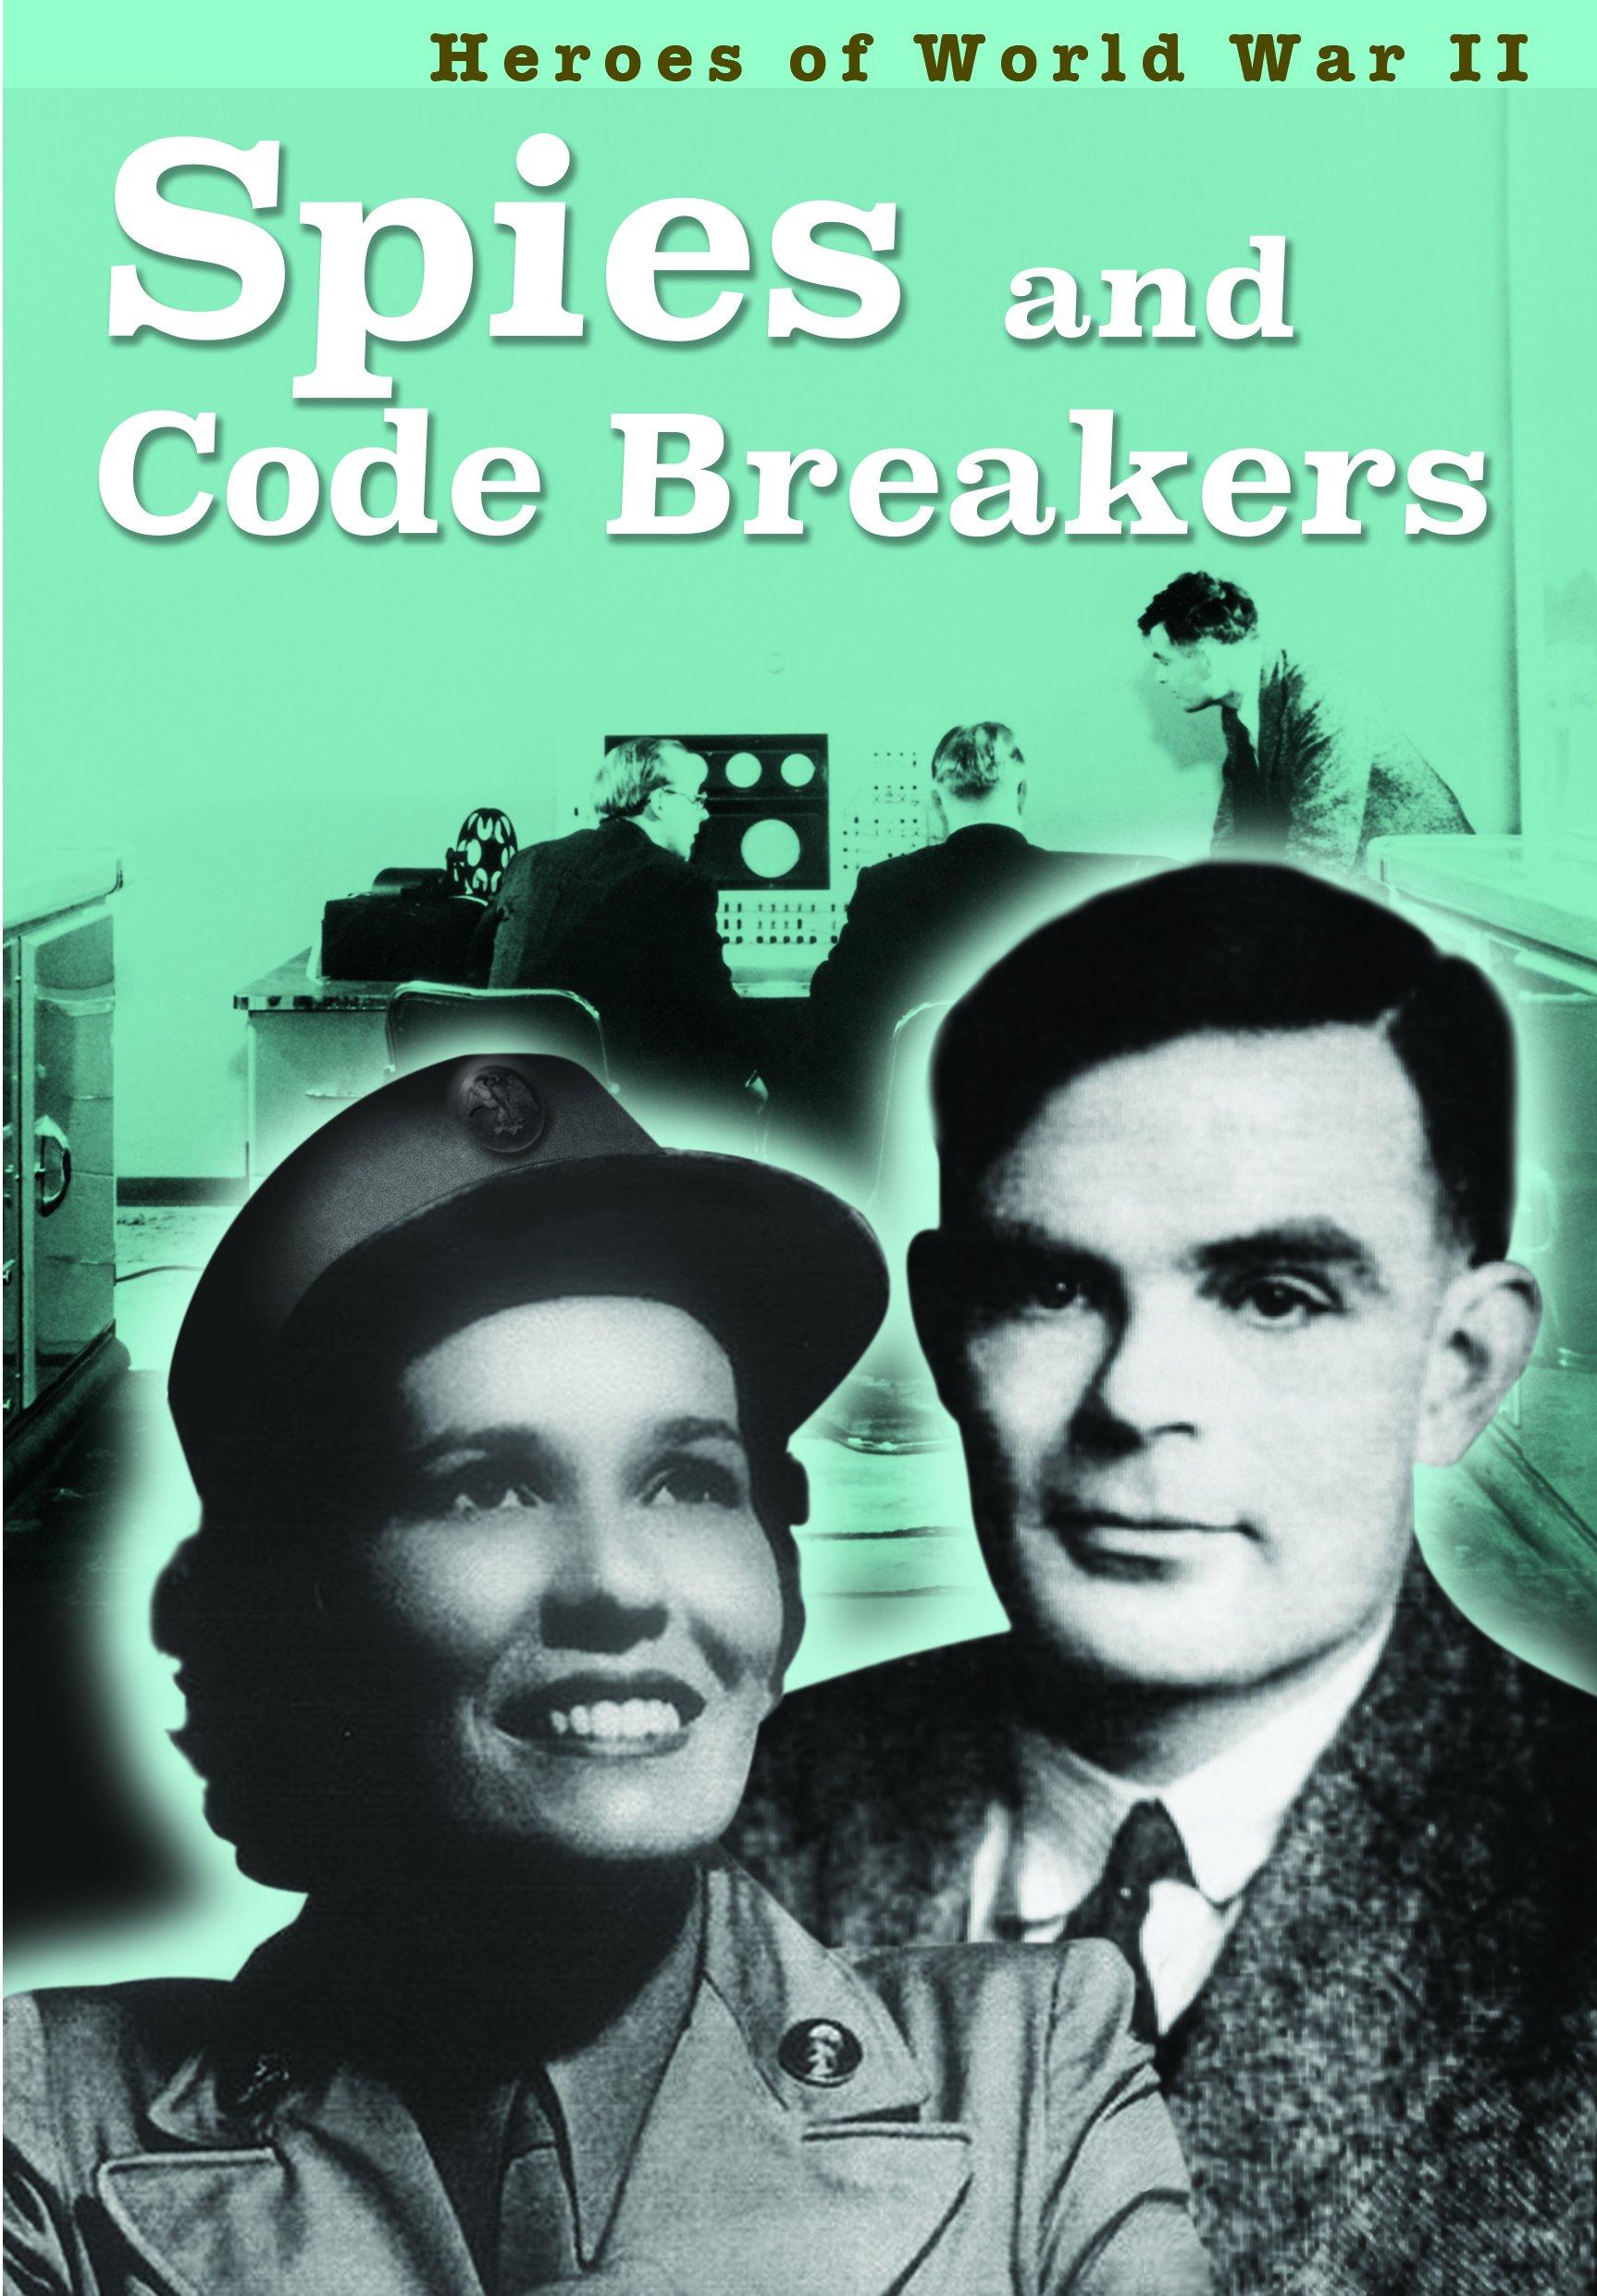 Spies and Codebreakers (Heroes of World War II)